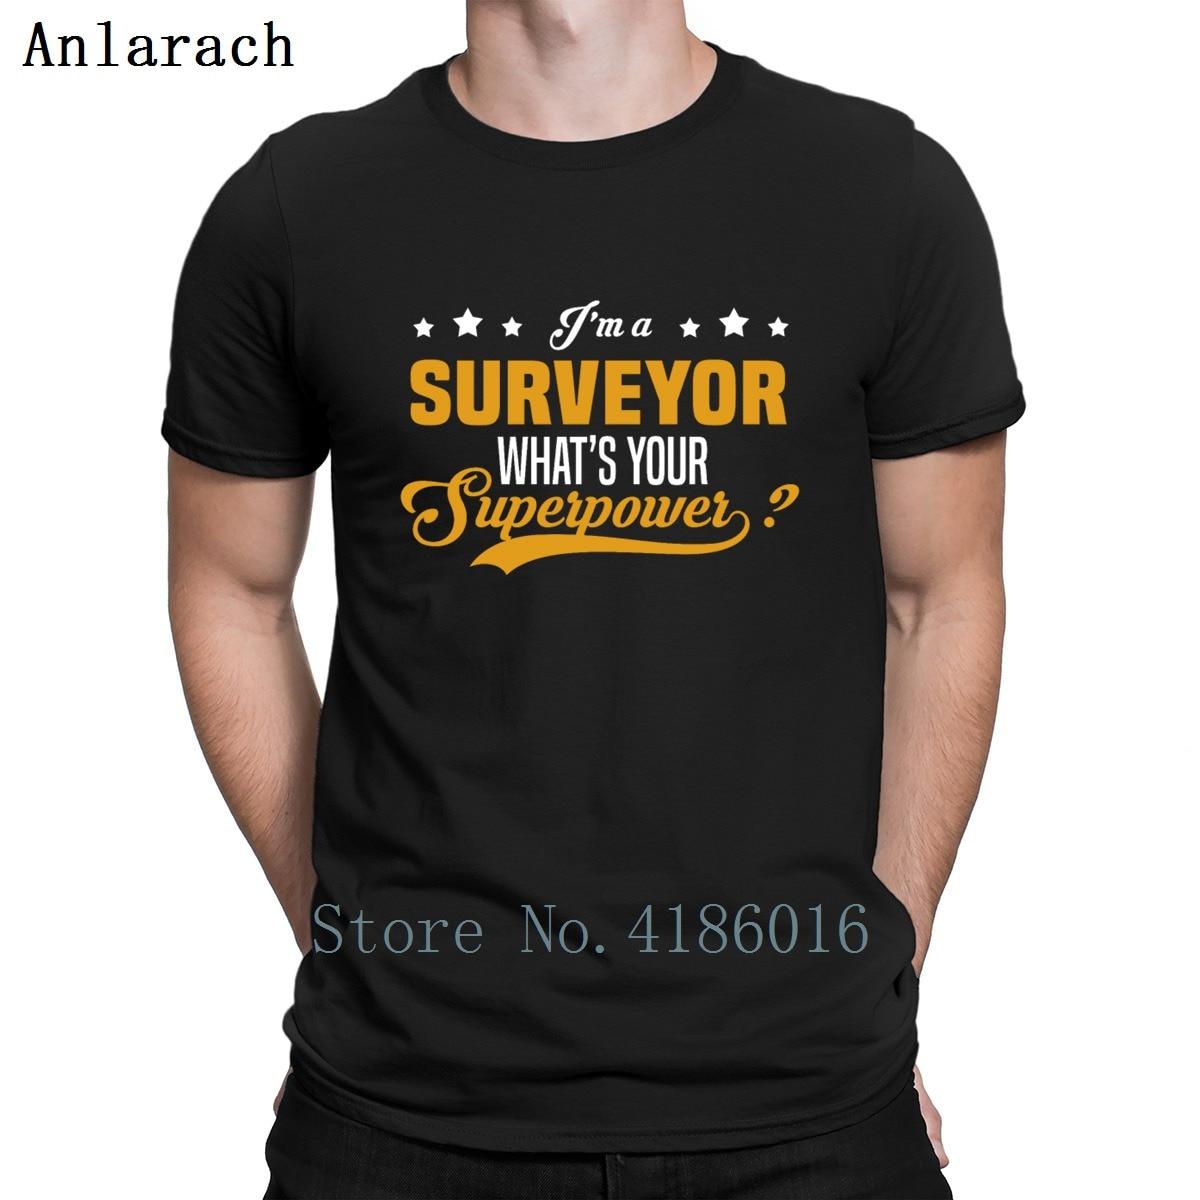 US $6 95 OFF Surveyor T Shirt Besar Lucu Lucu Unik Tee Kemeja Lengan Pendek Kreatif Kualitas Sinar Matahari T Shirt AliExpress